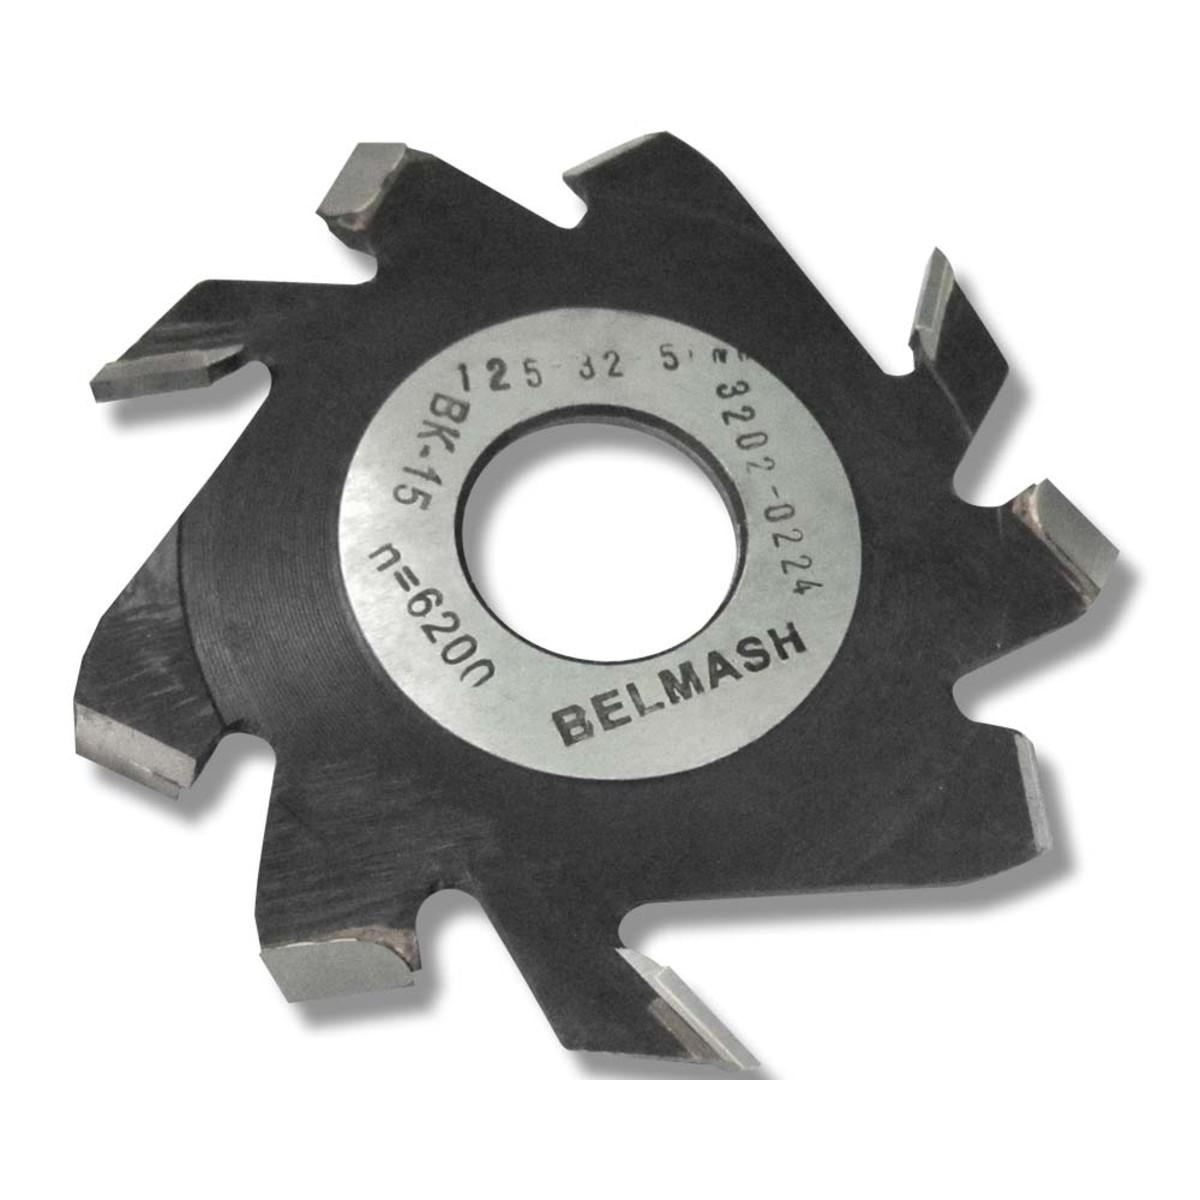 Фреза дисковая пазовая по дереву BELMASH 125x32x5 мм с подрезающими зубьями 9 зубьев